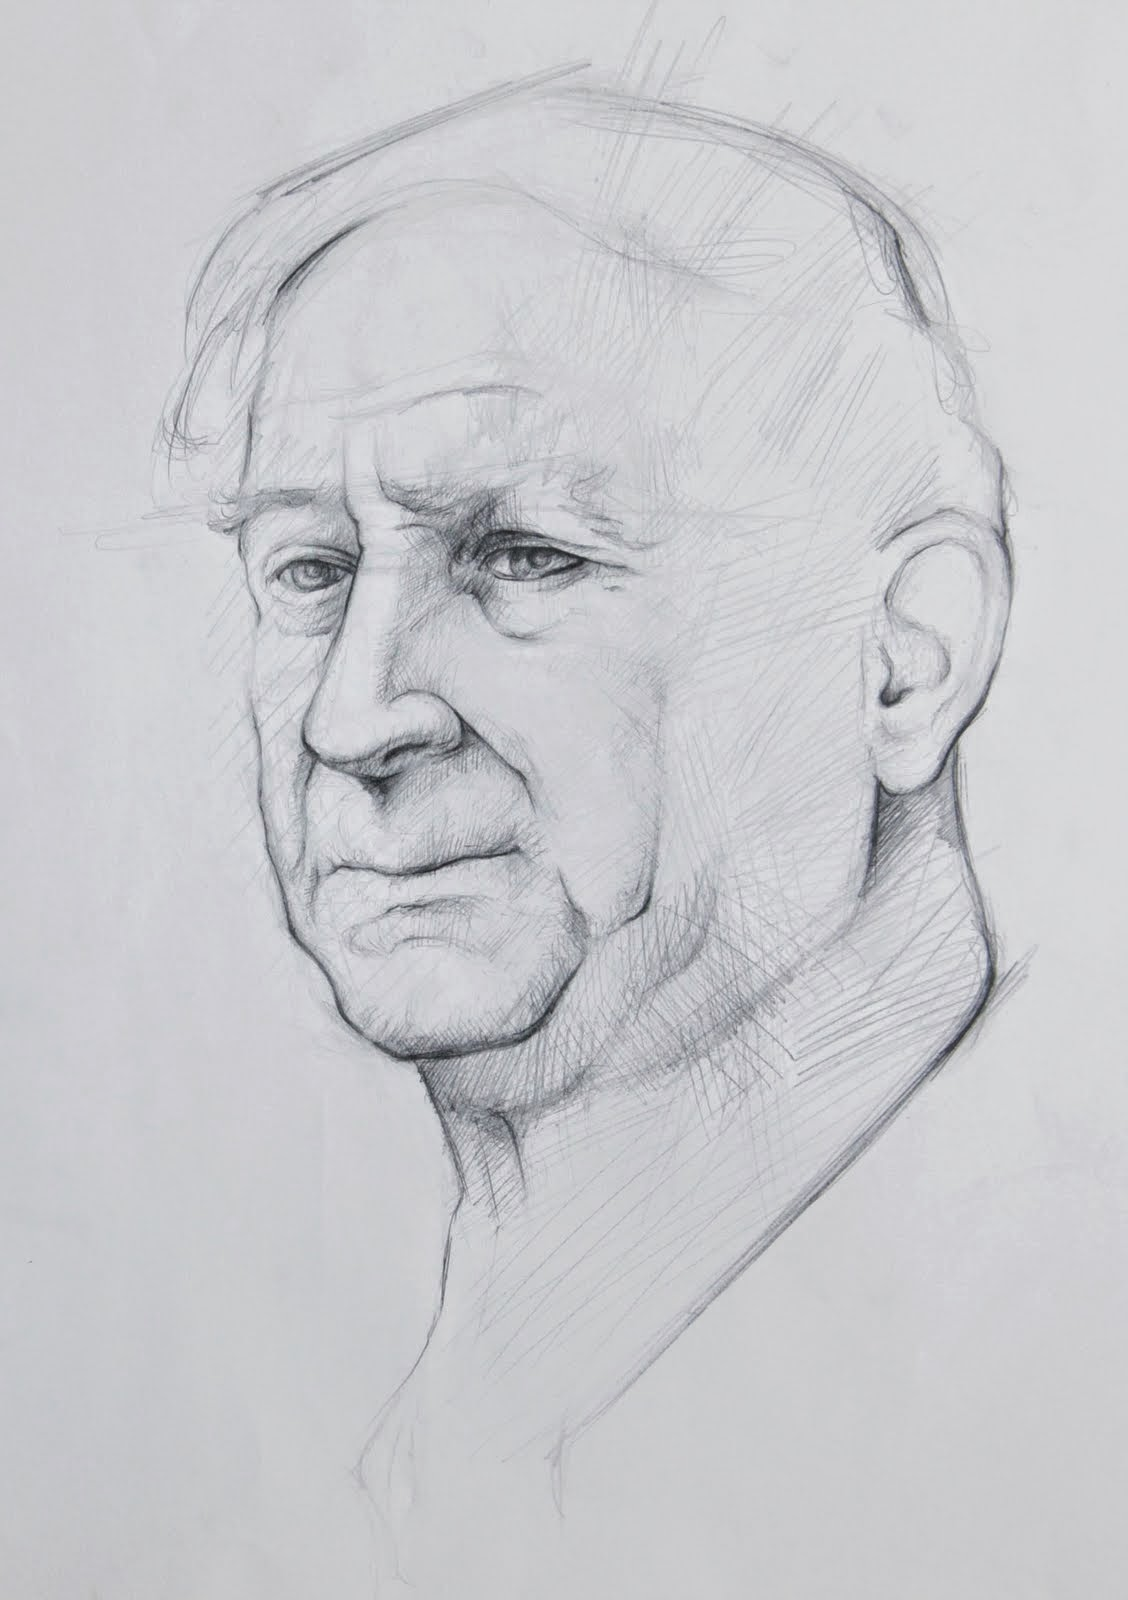 resim kursu portre çalışması